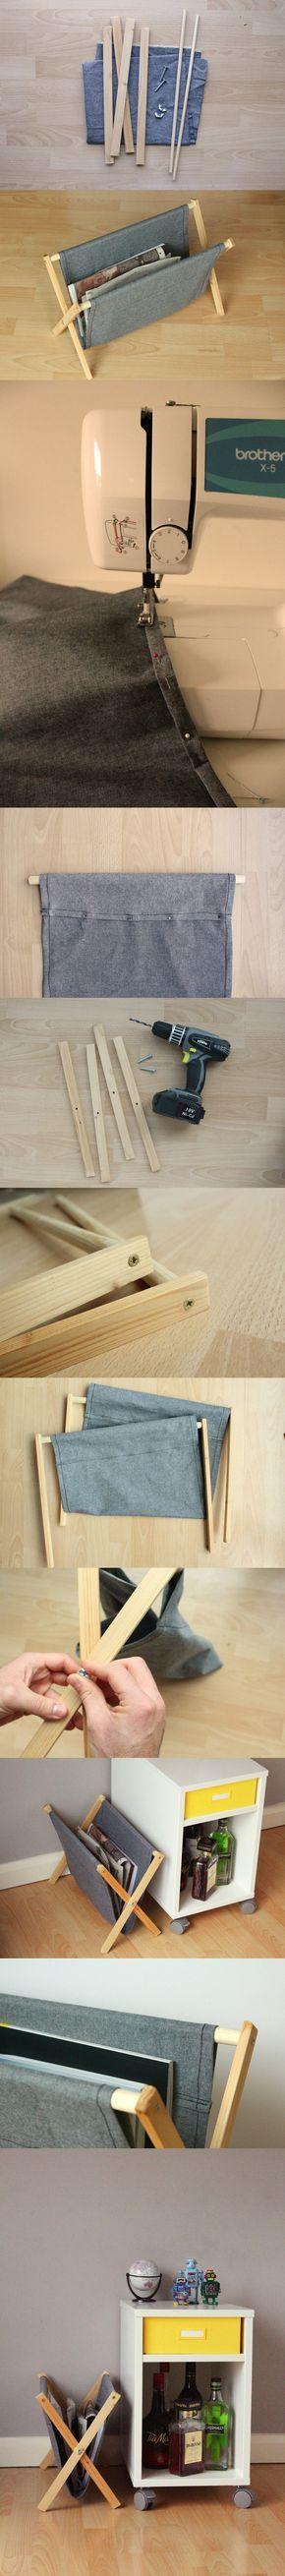 Un revistero plegable DIY - Vía http://www.manmadediy.com/